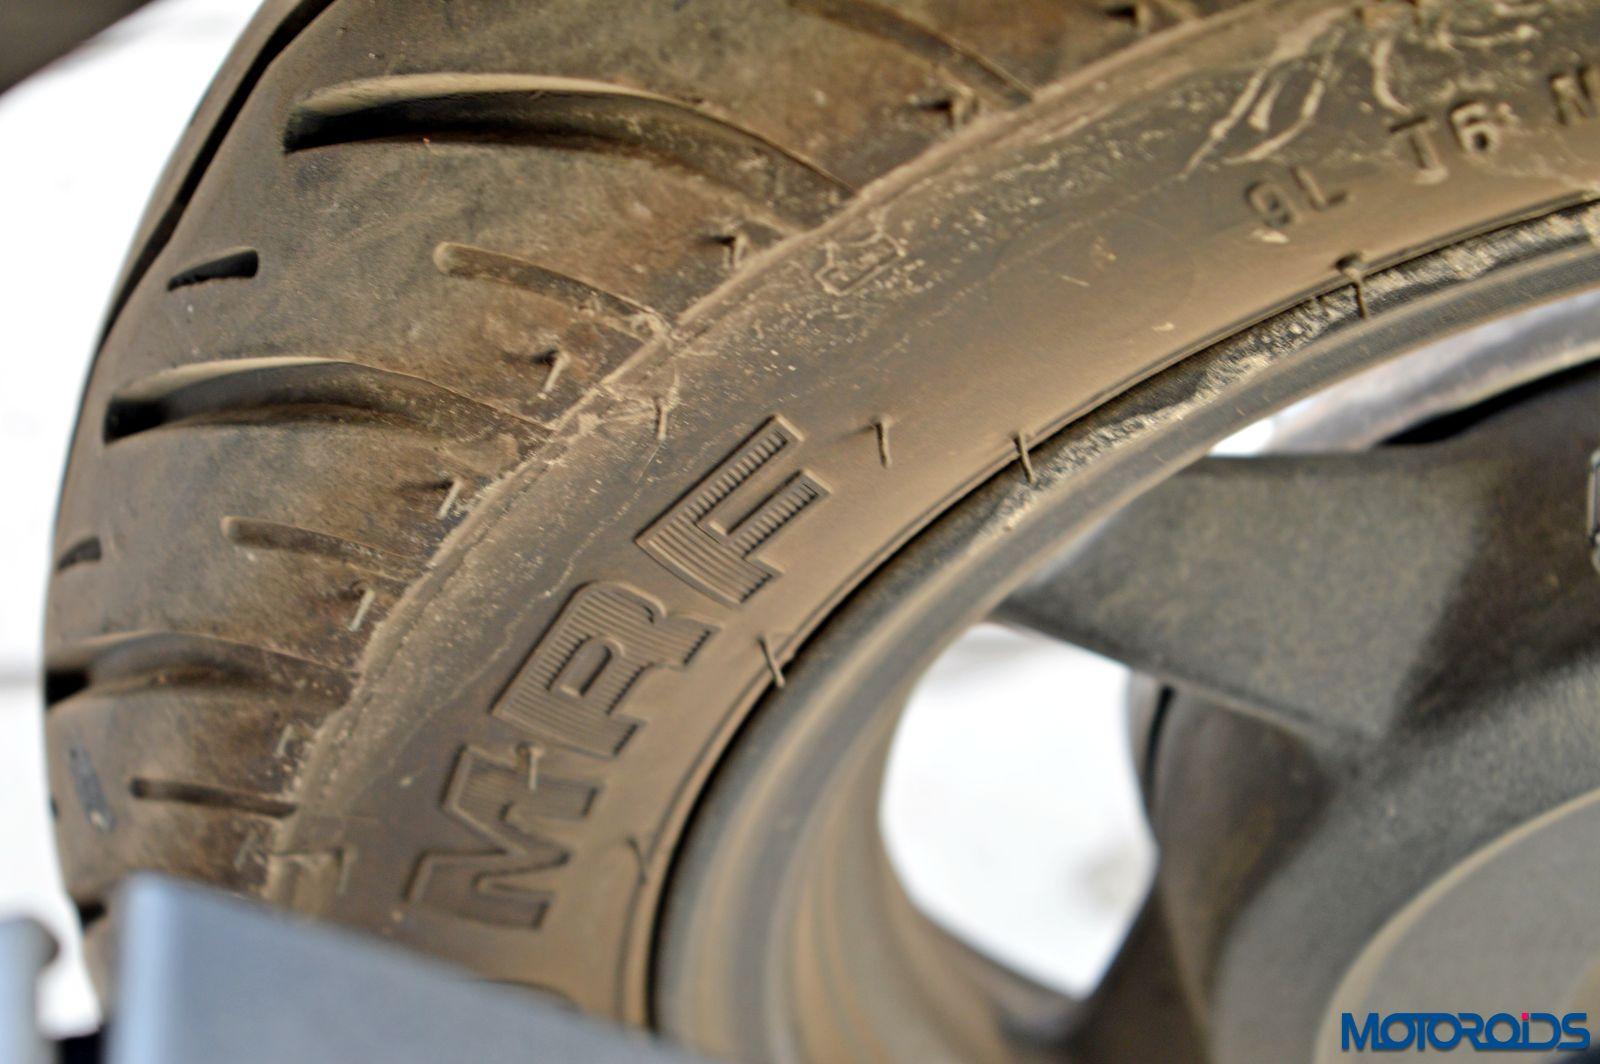 Hero Maestro Edge - Review - Details - Tyre (4)